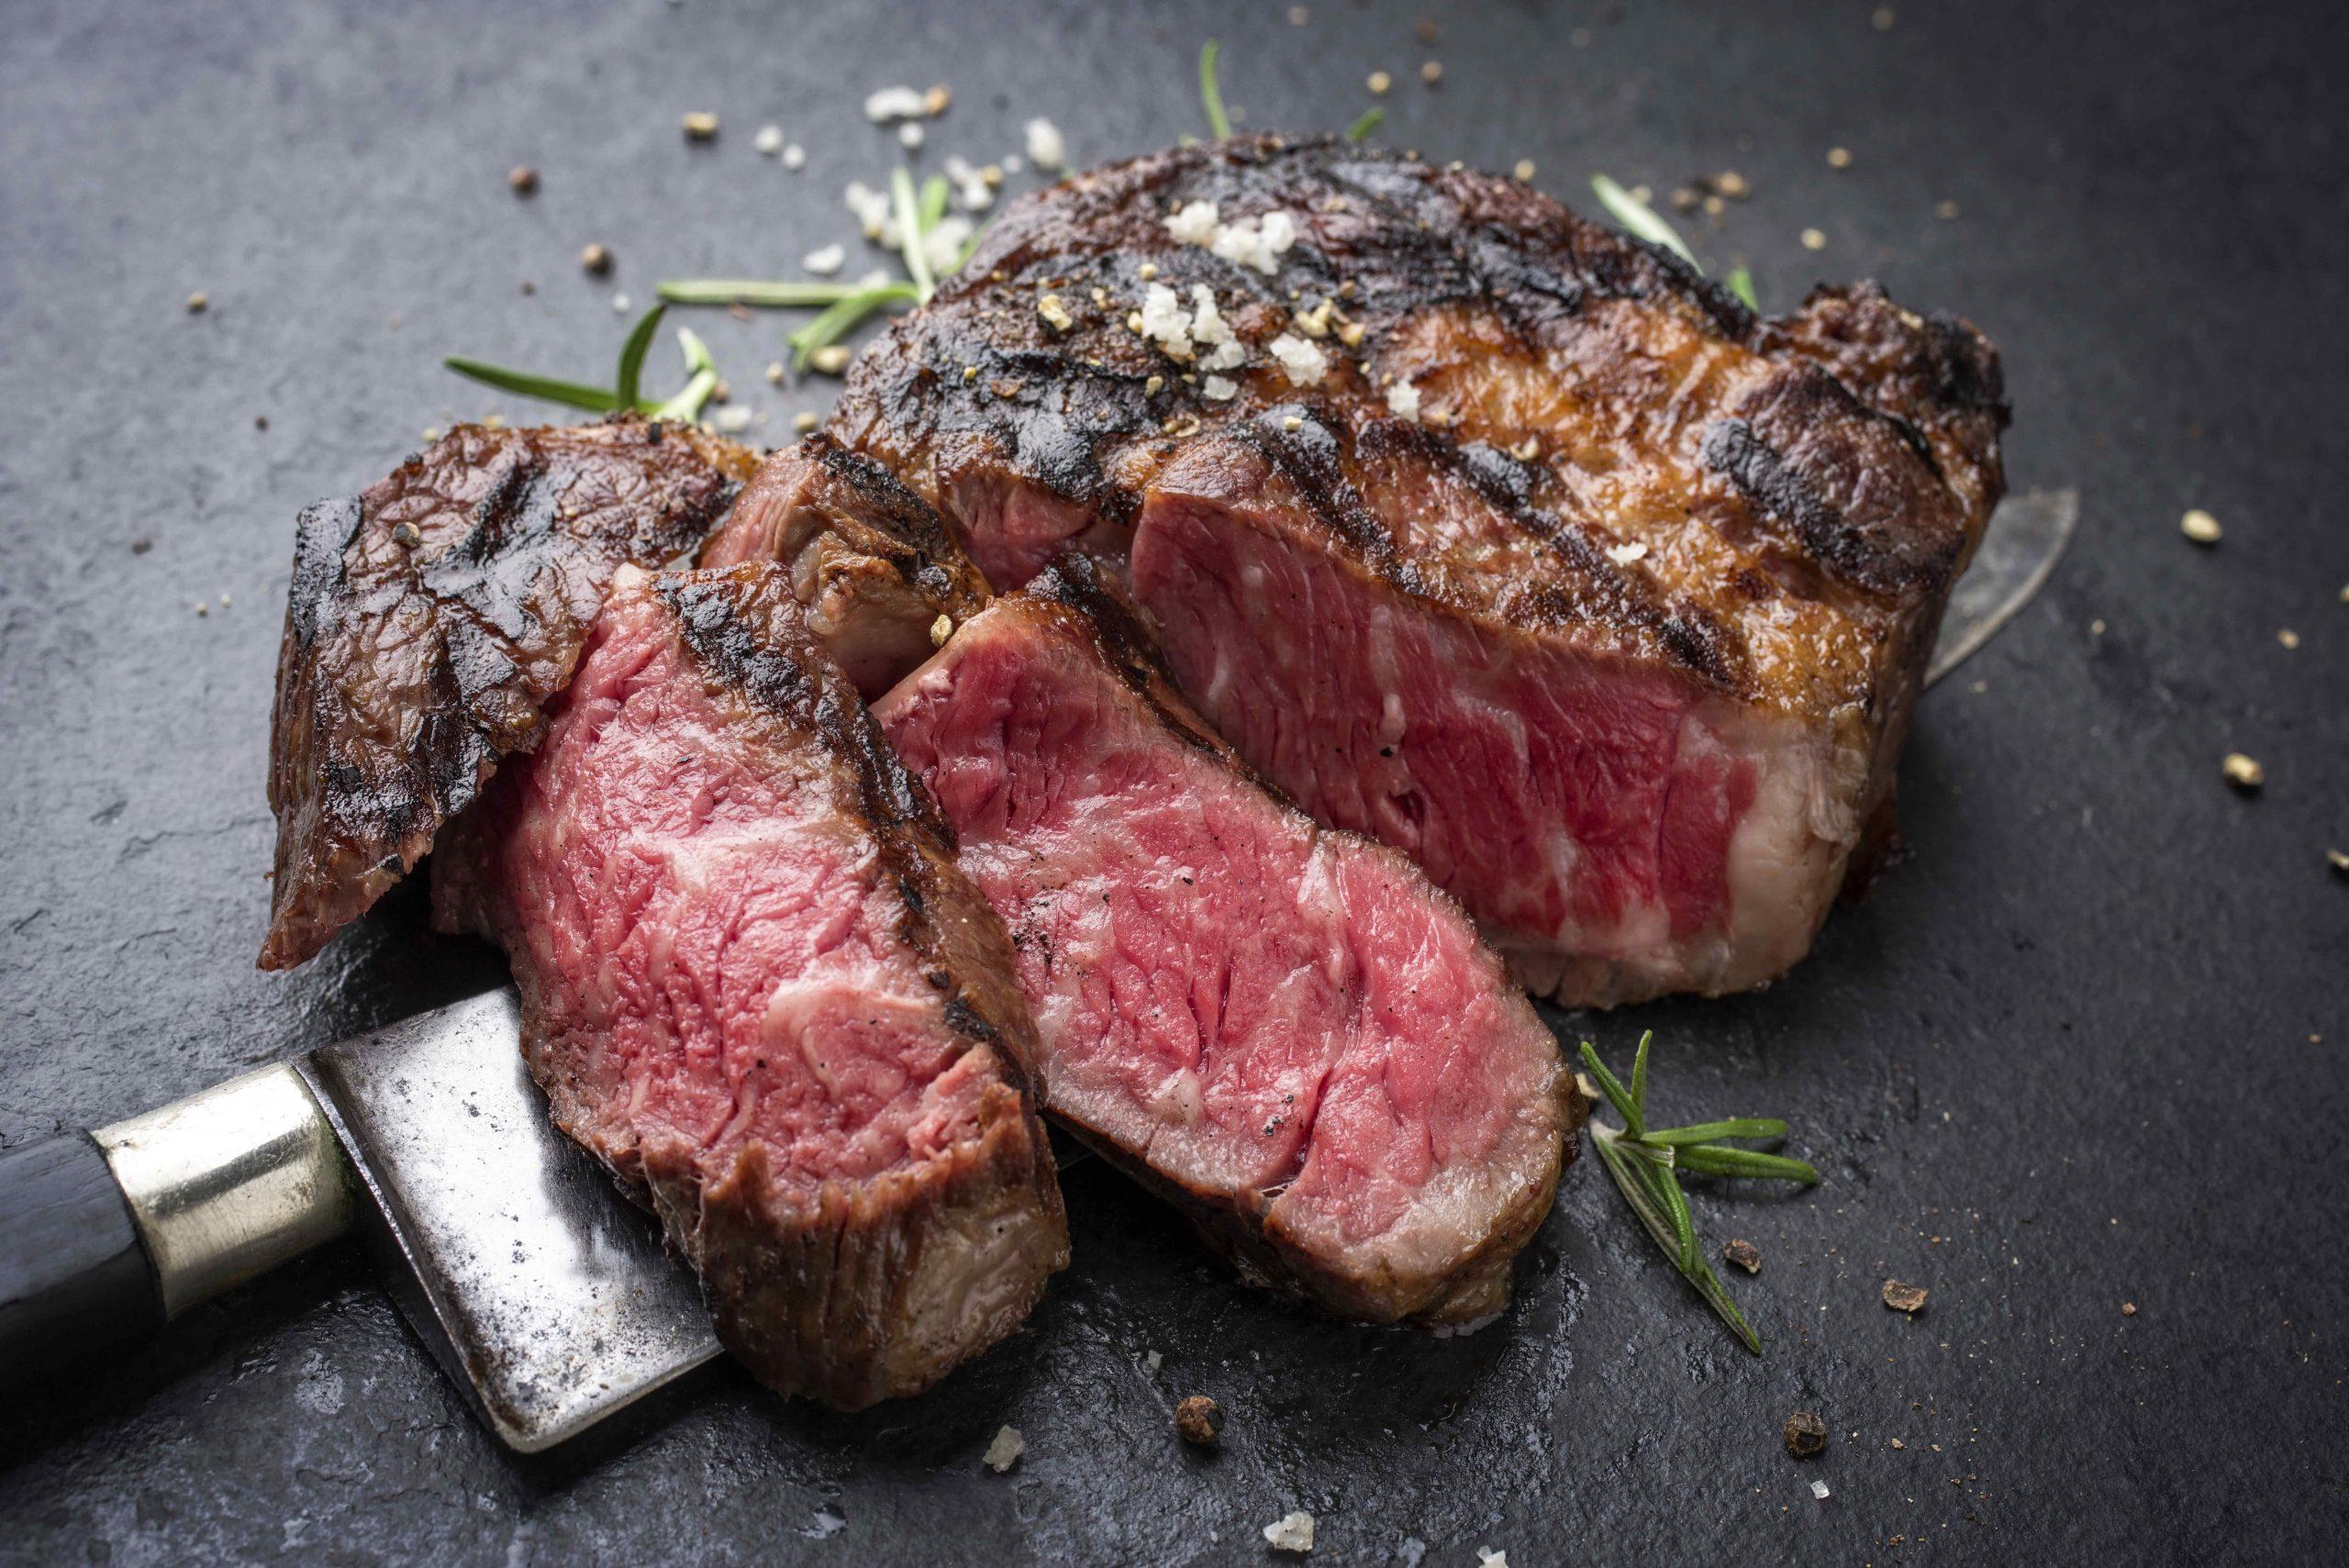 Barbecue aged wagyu rib-eye steak